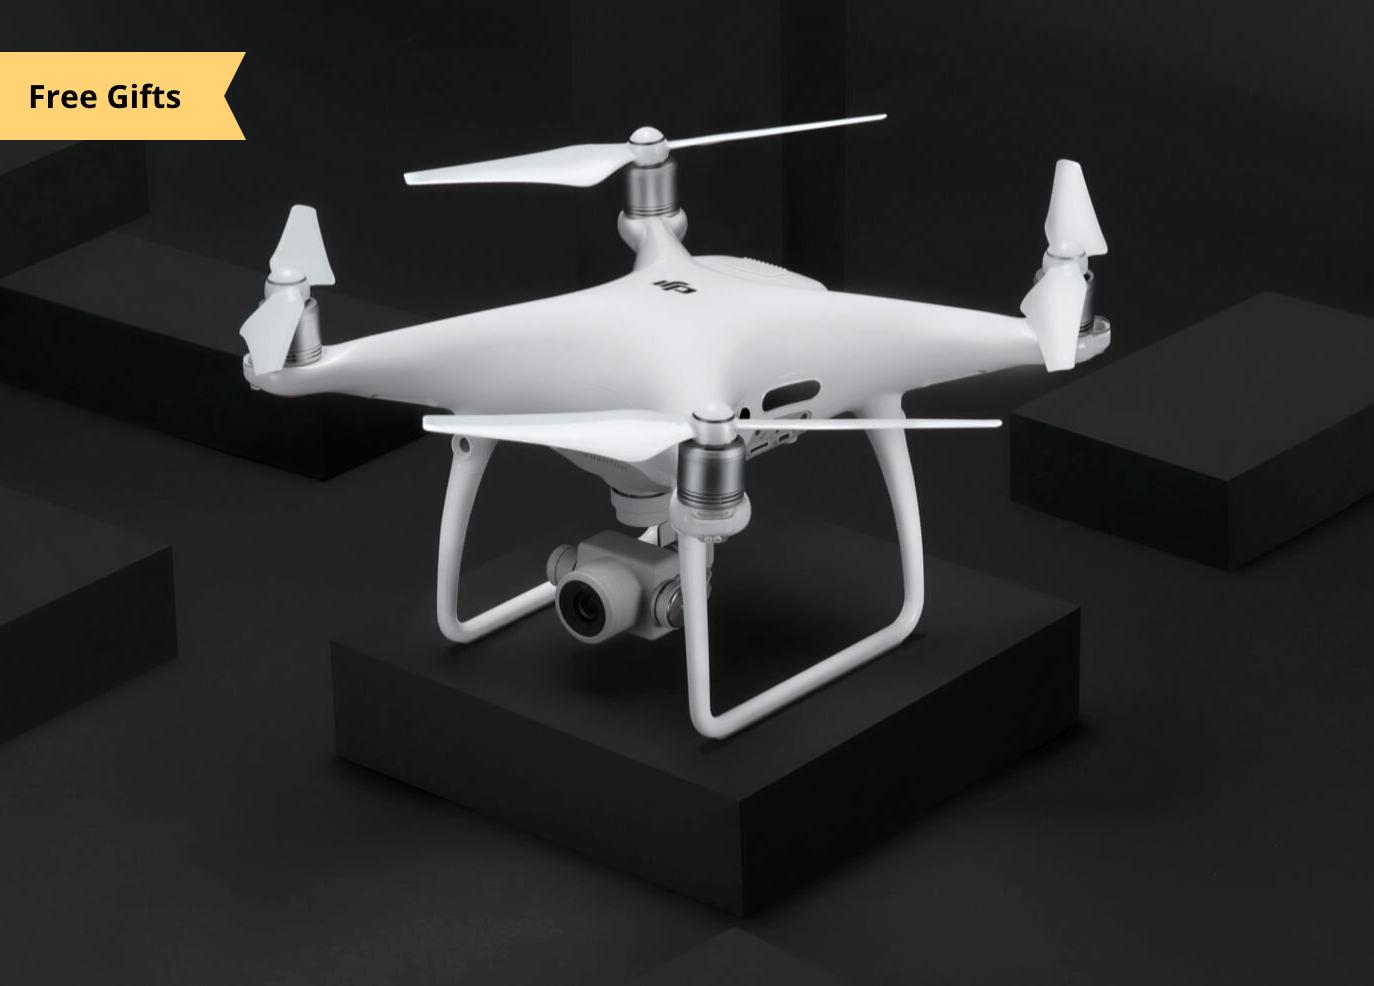 DJI Phantom Professional Black Friday Drone Deal